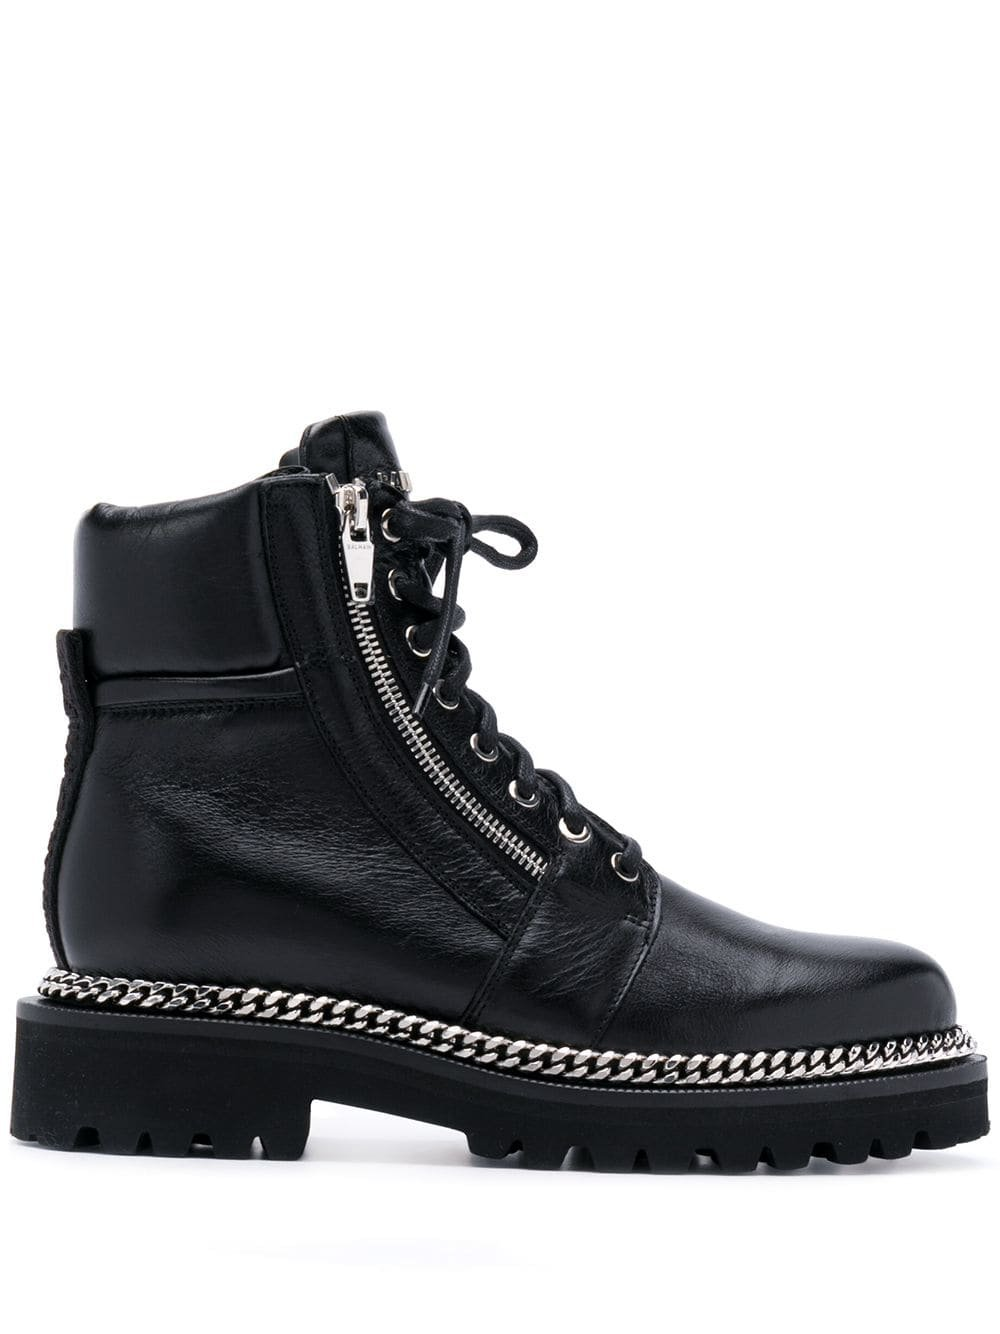 Balmain Ranger Army Ankle Boots - Farfetch